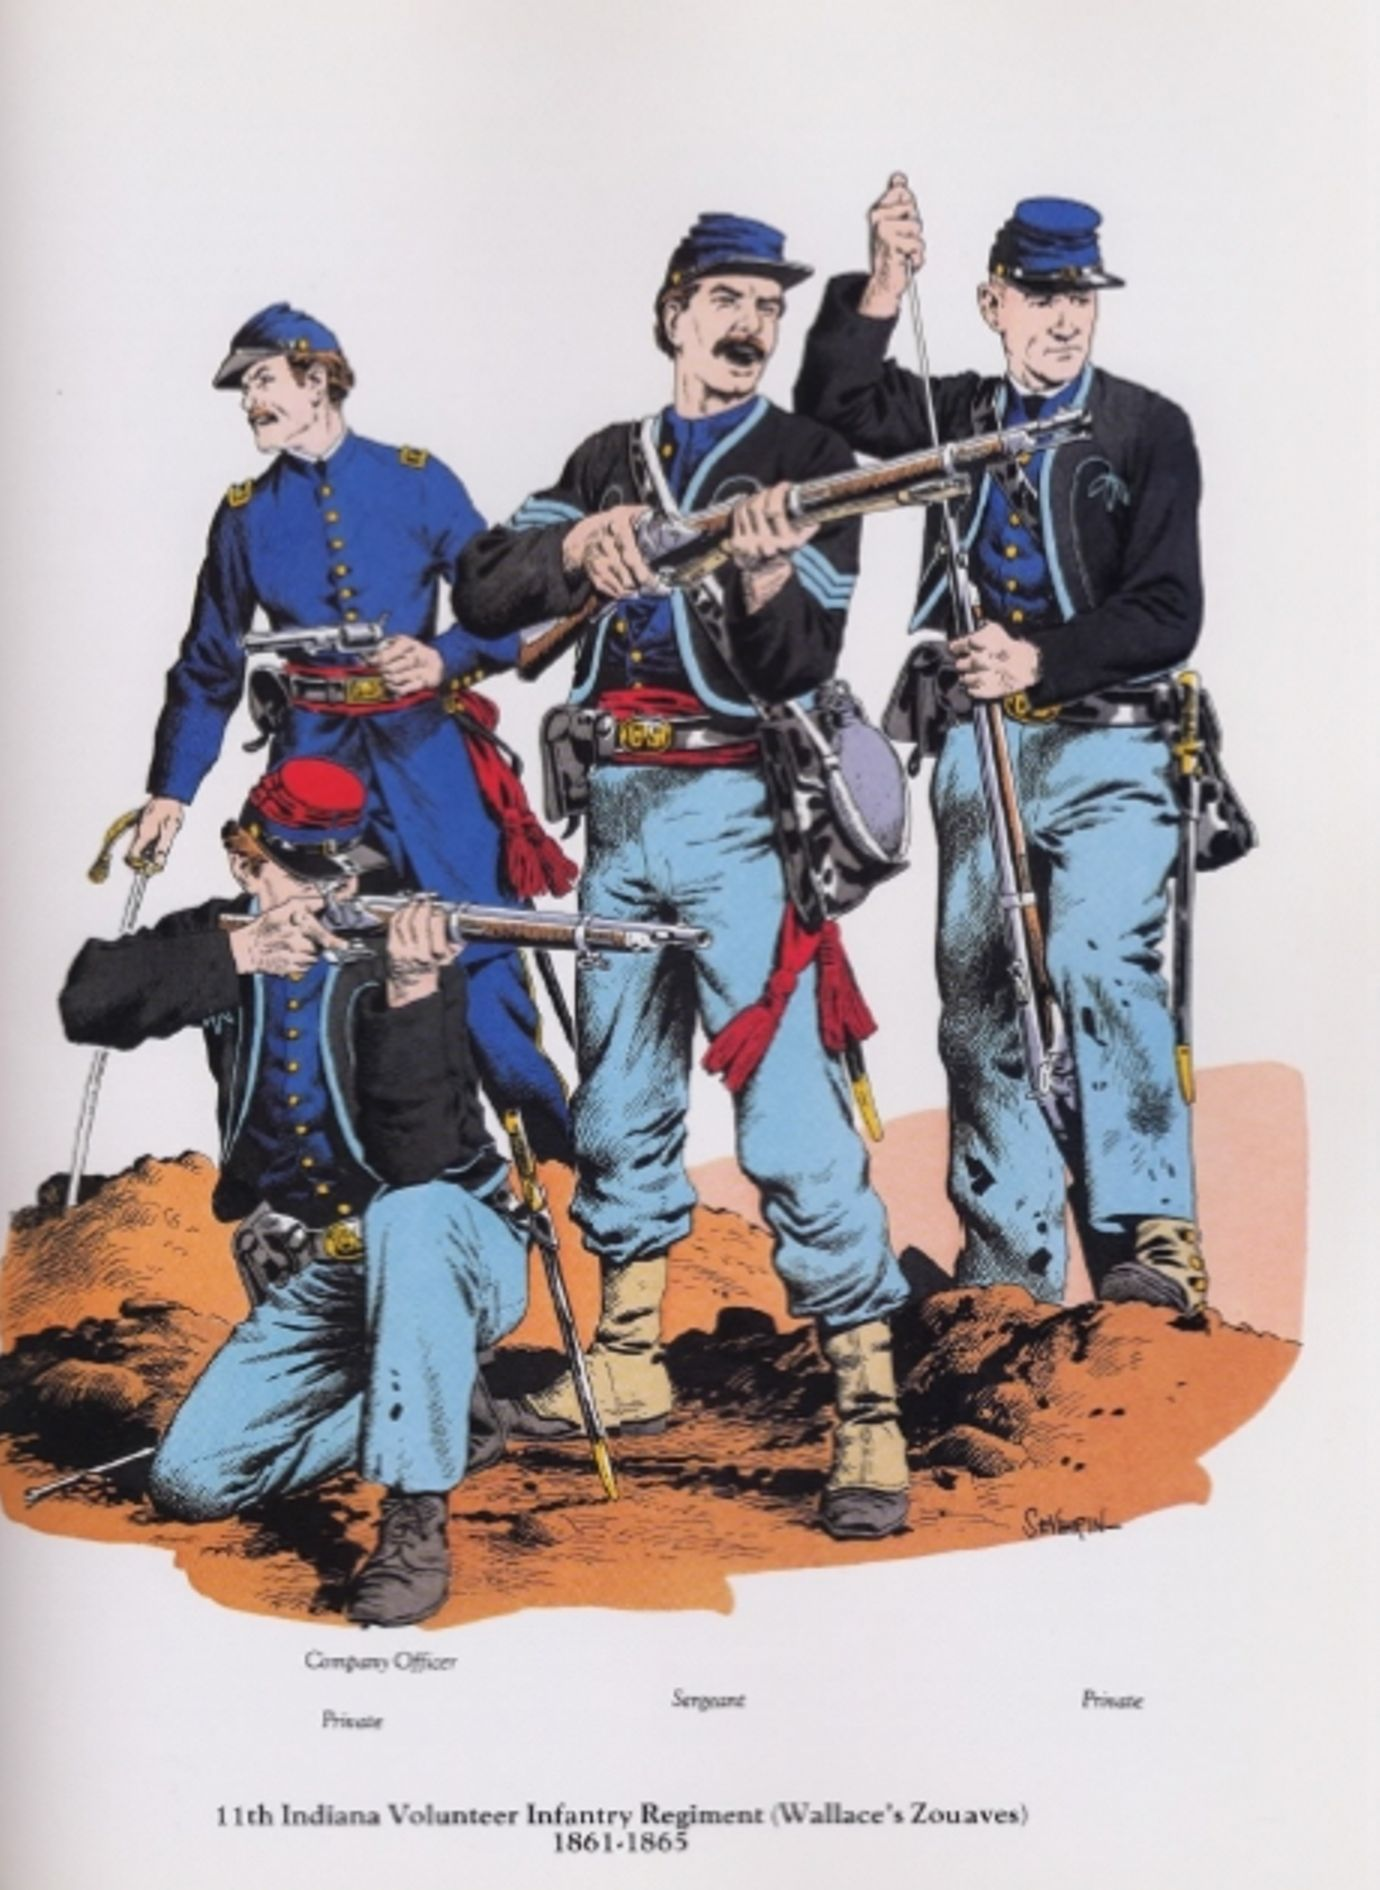 Pin de Bill Gorry en American Civil War | Pinterest | Soldados, De ...